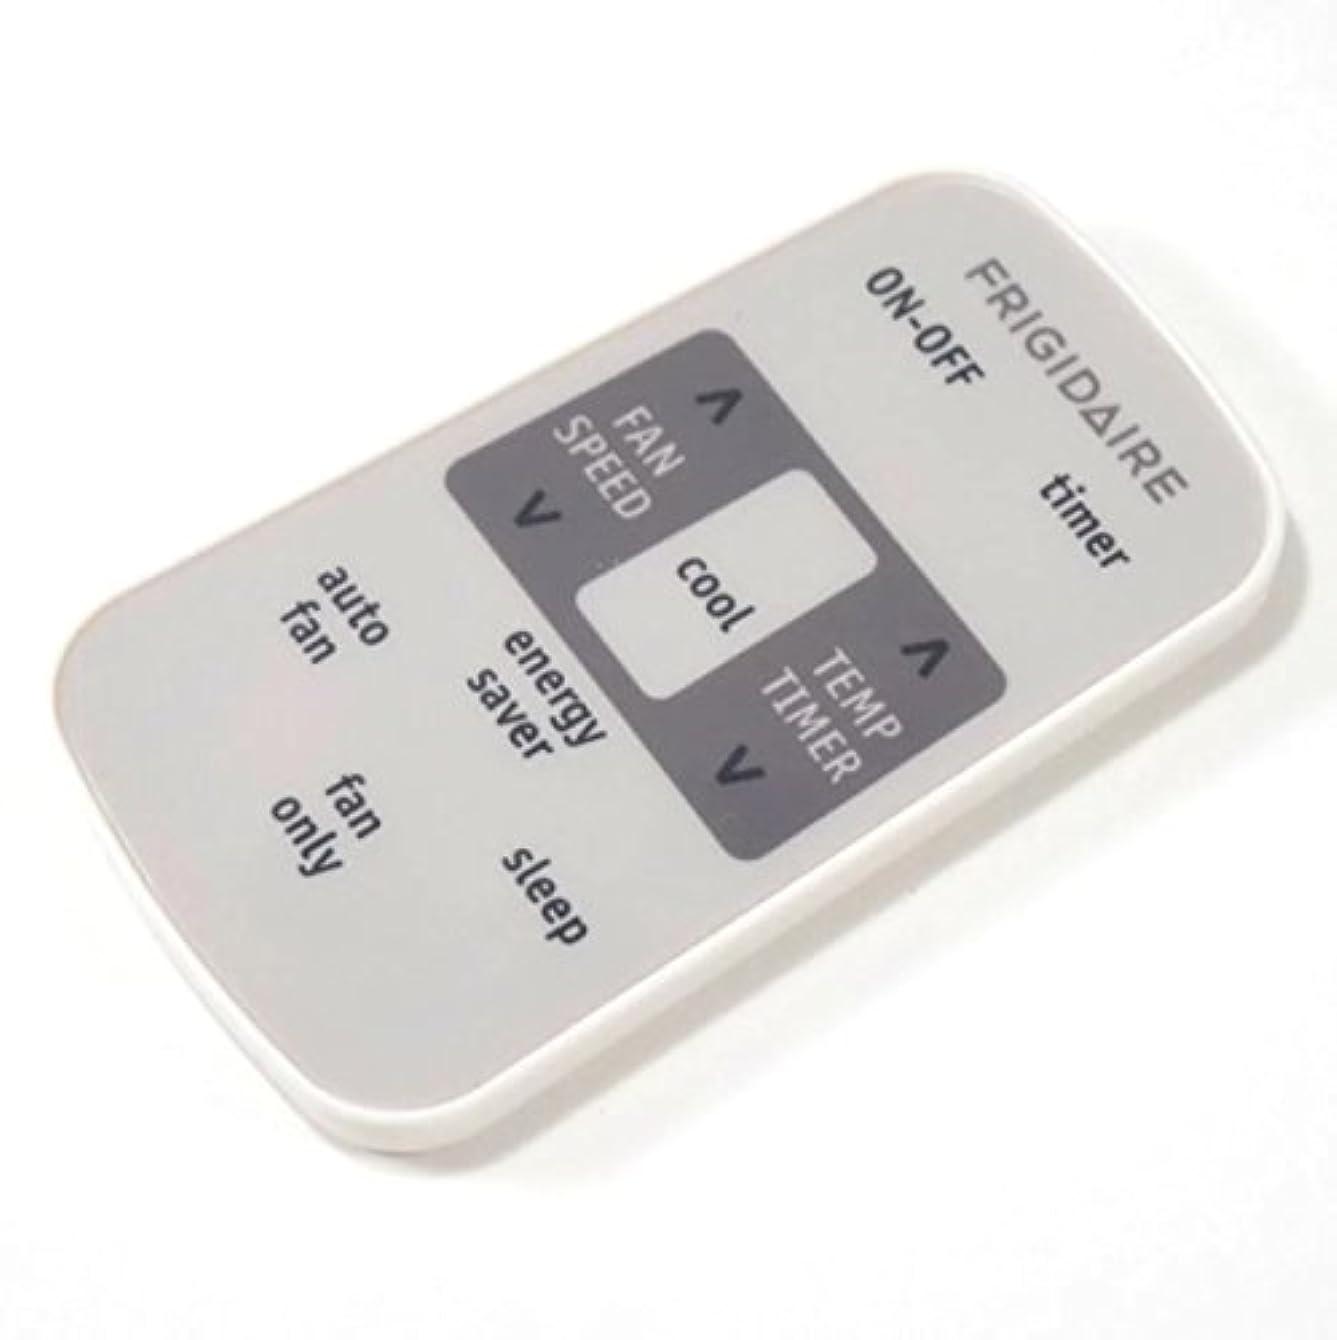 FRIGIDAIRE Remote Control, White